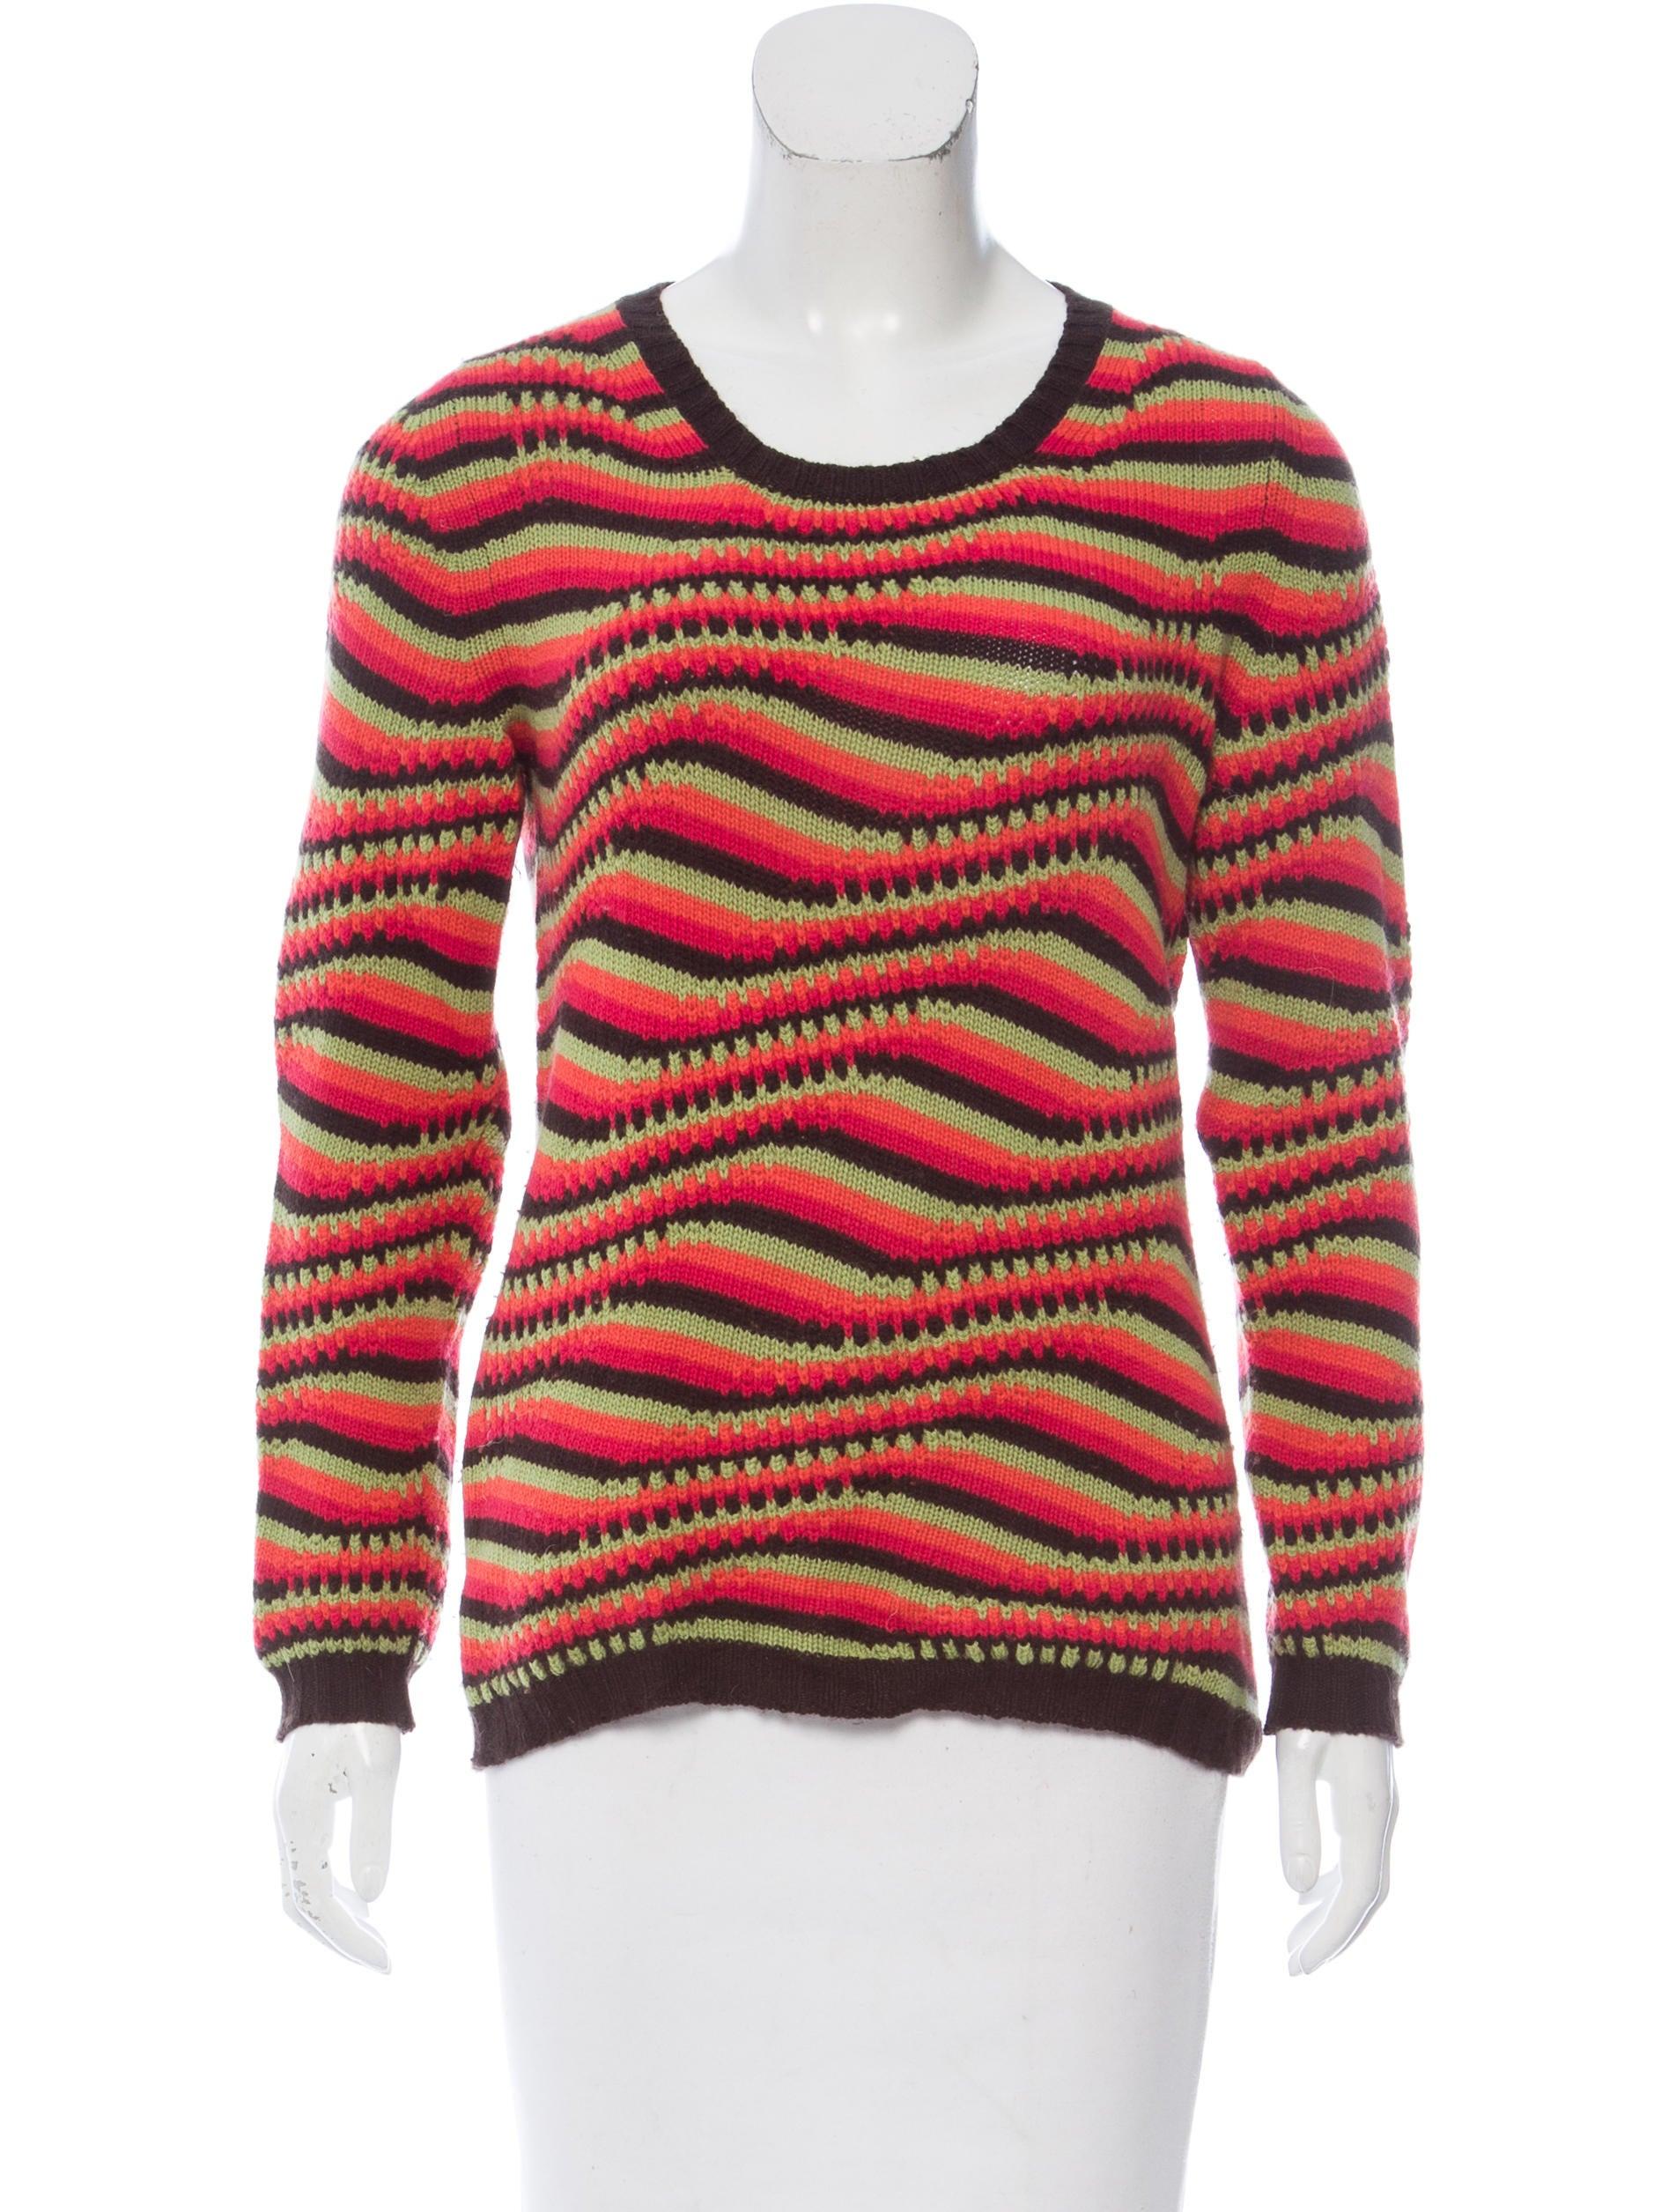 Prada Cashmere Jacquard Sweater - Clothing